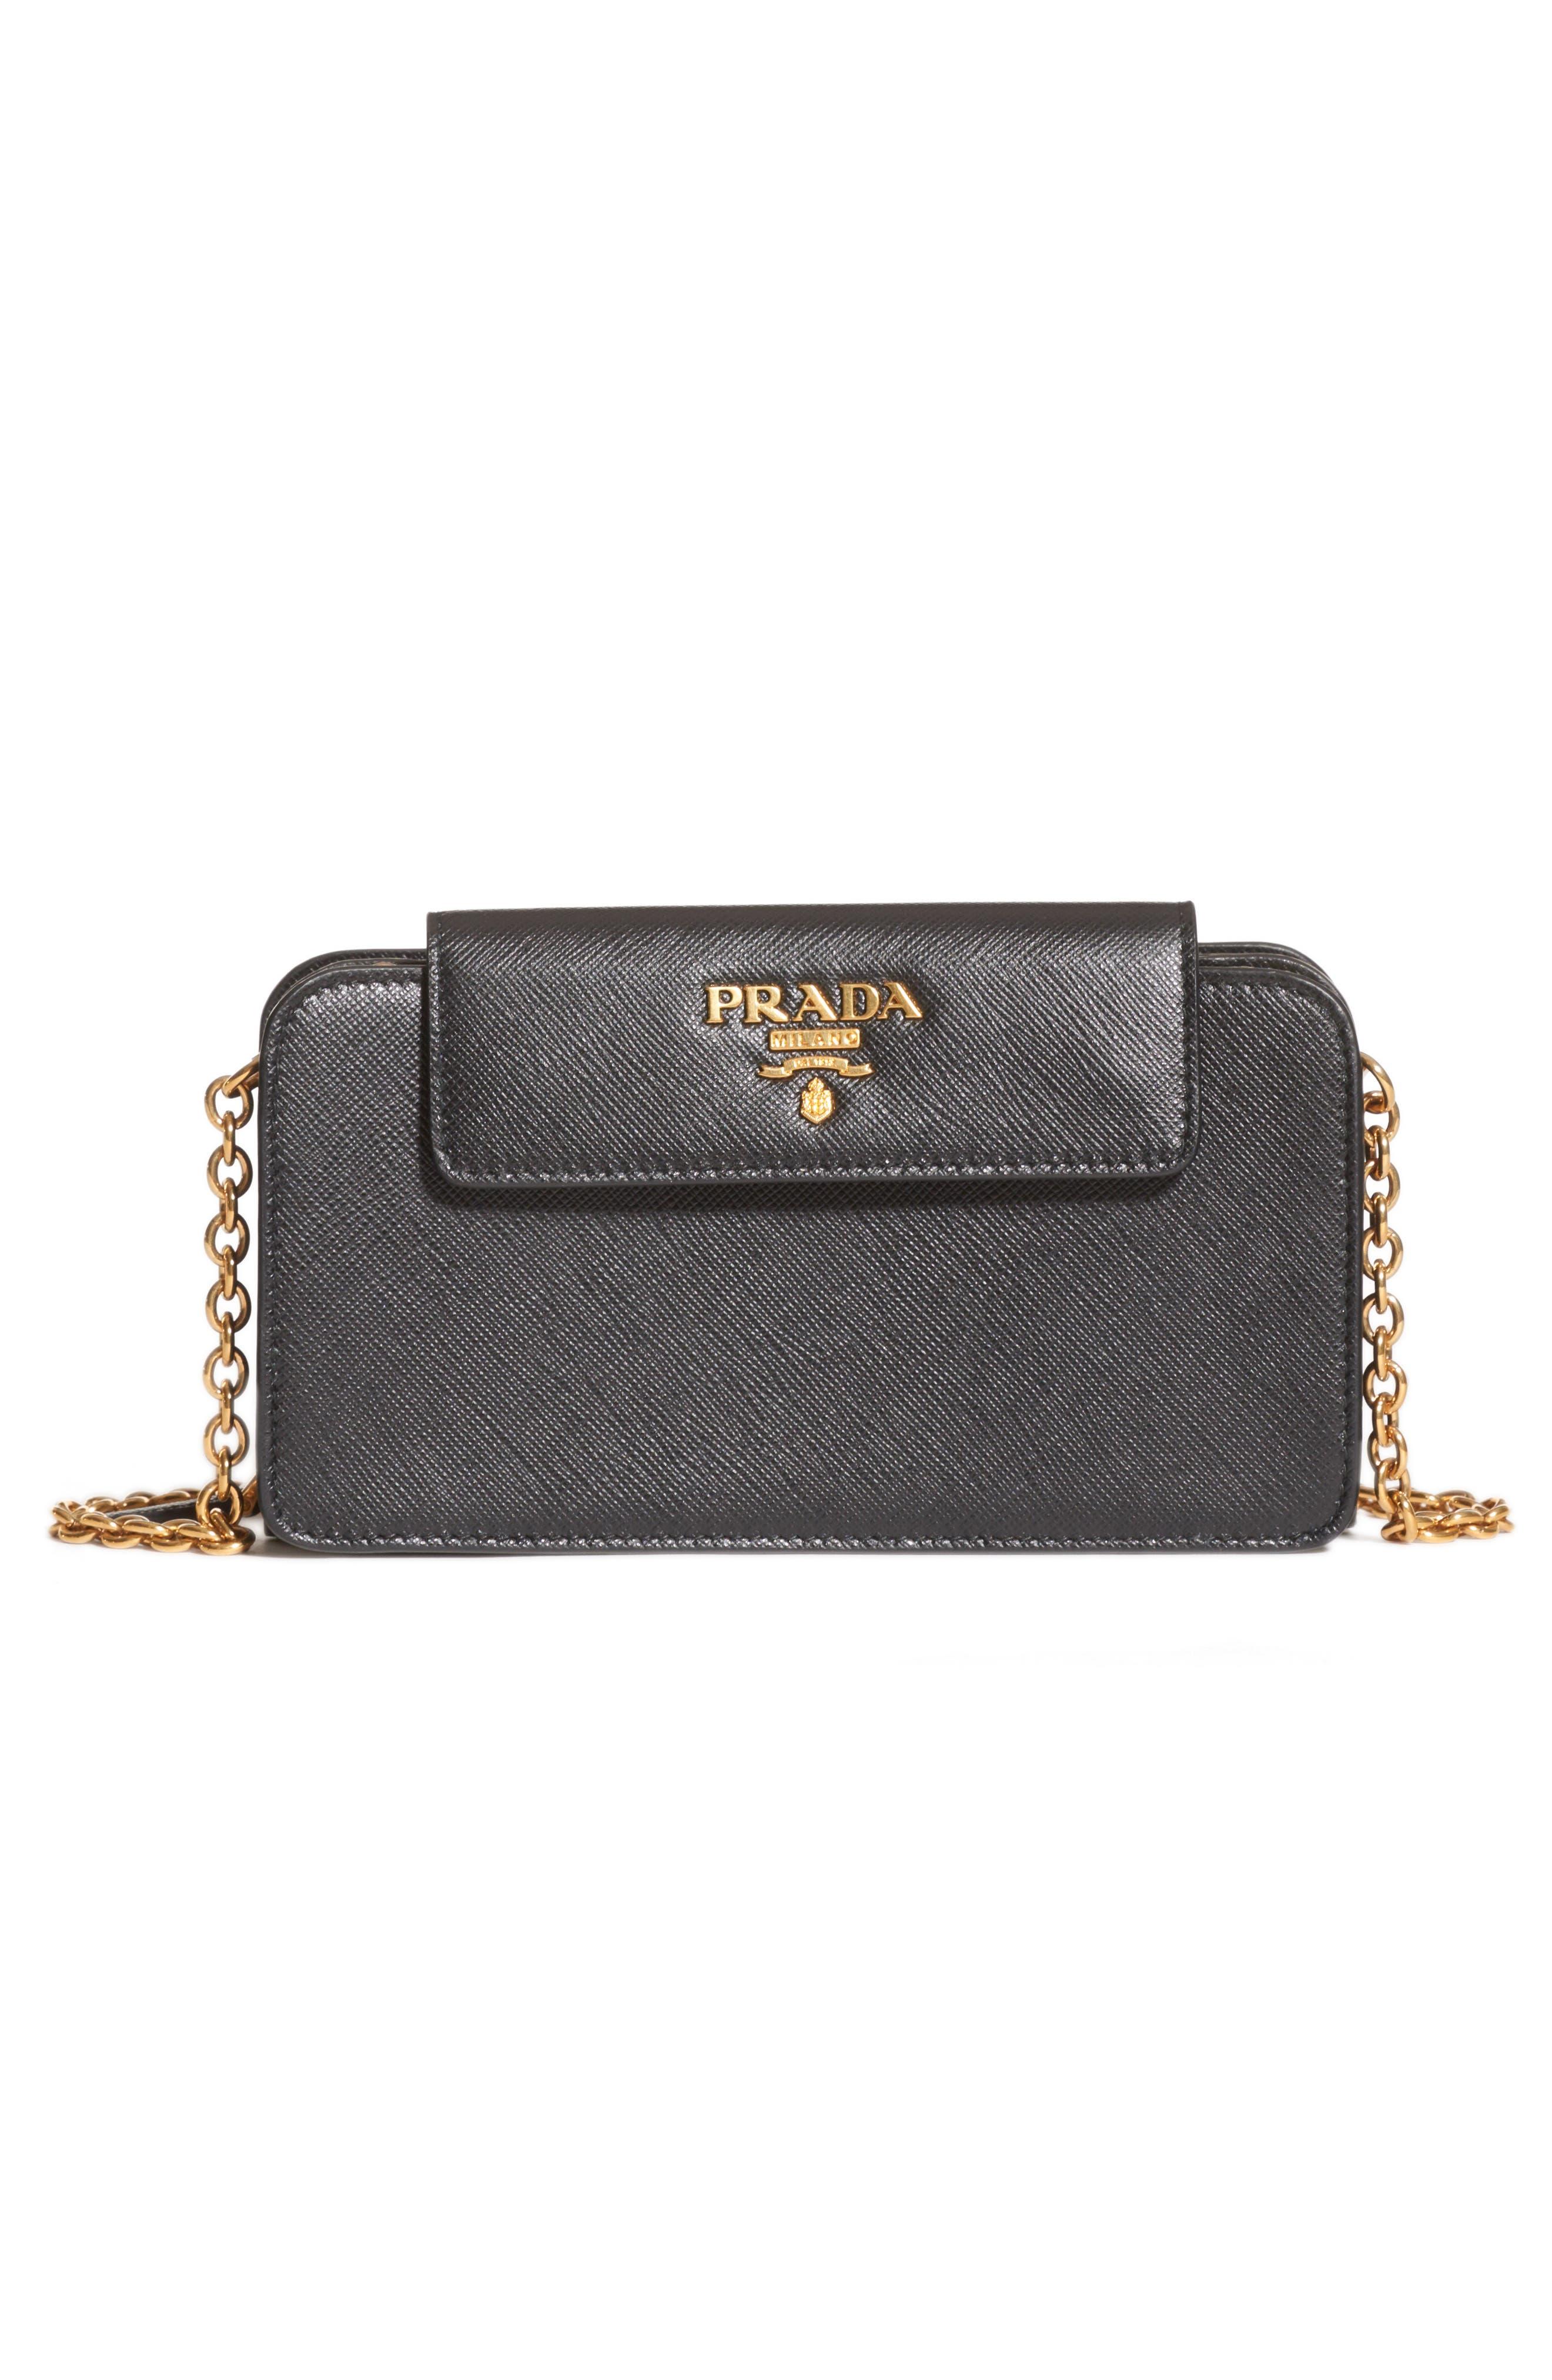 PRADA, Saffiano Leather Wallet on a Chain, Main thumbnail 1, color, NERO